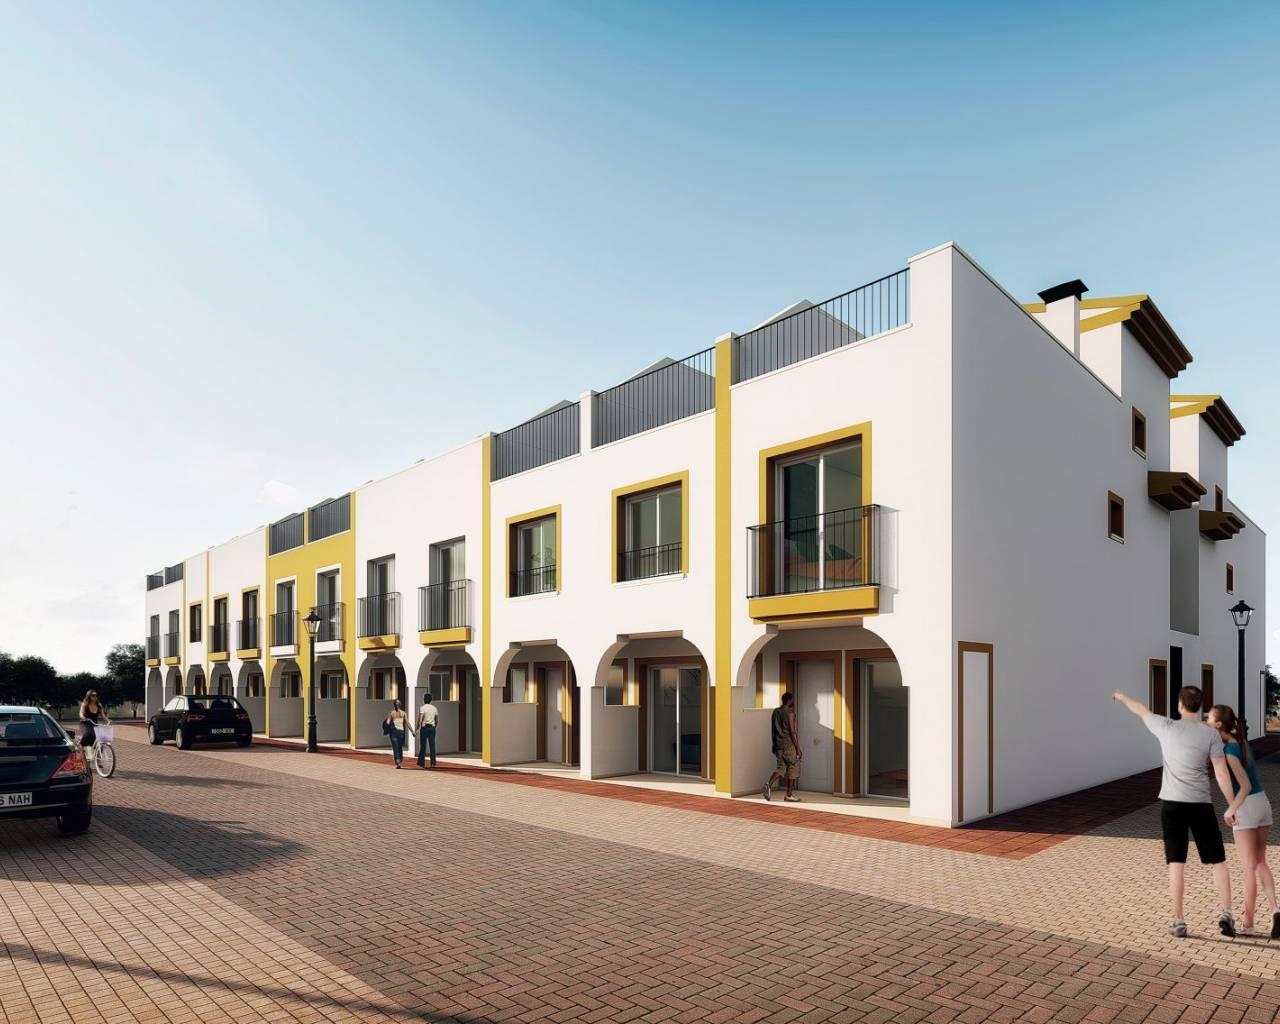 nieuwbouw-geschakelde-woning-duplex-torre-pacheco-santa-rosalia_4599_xl